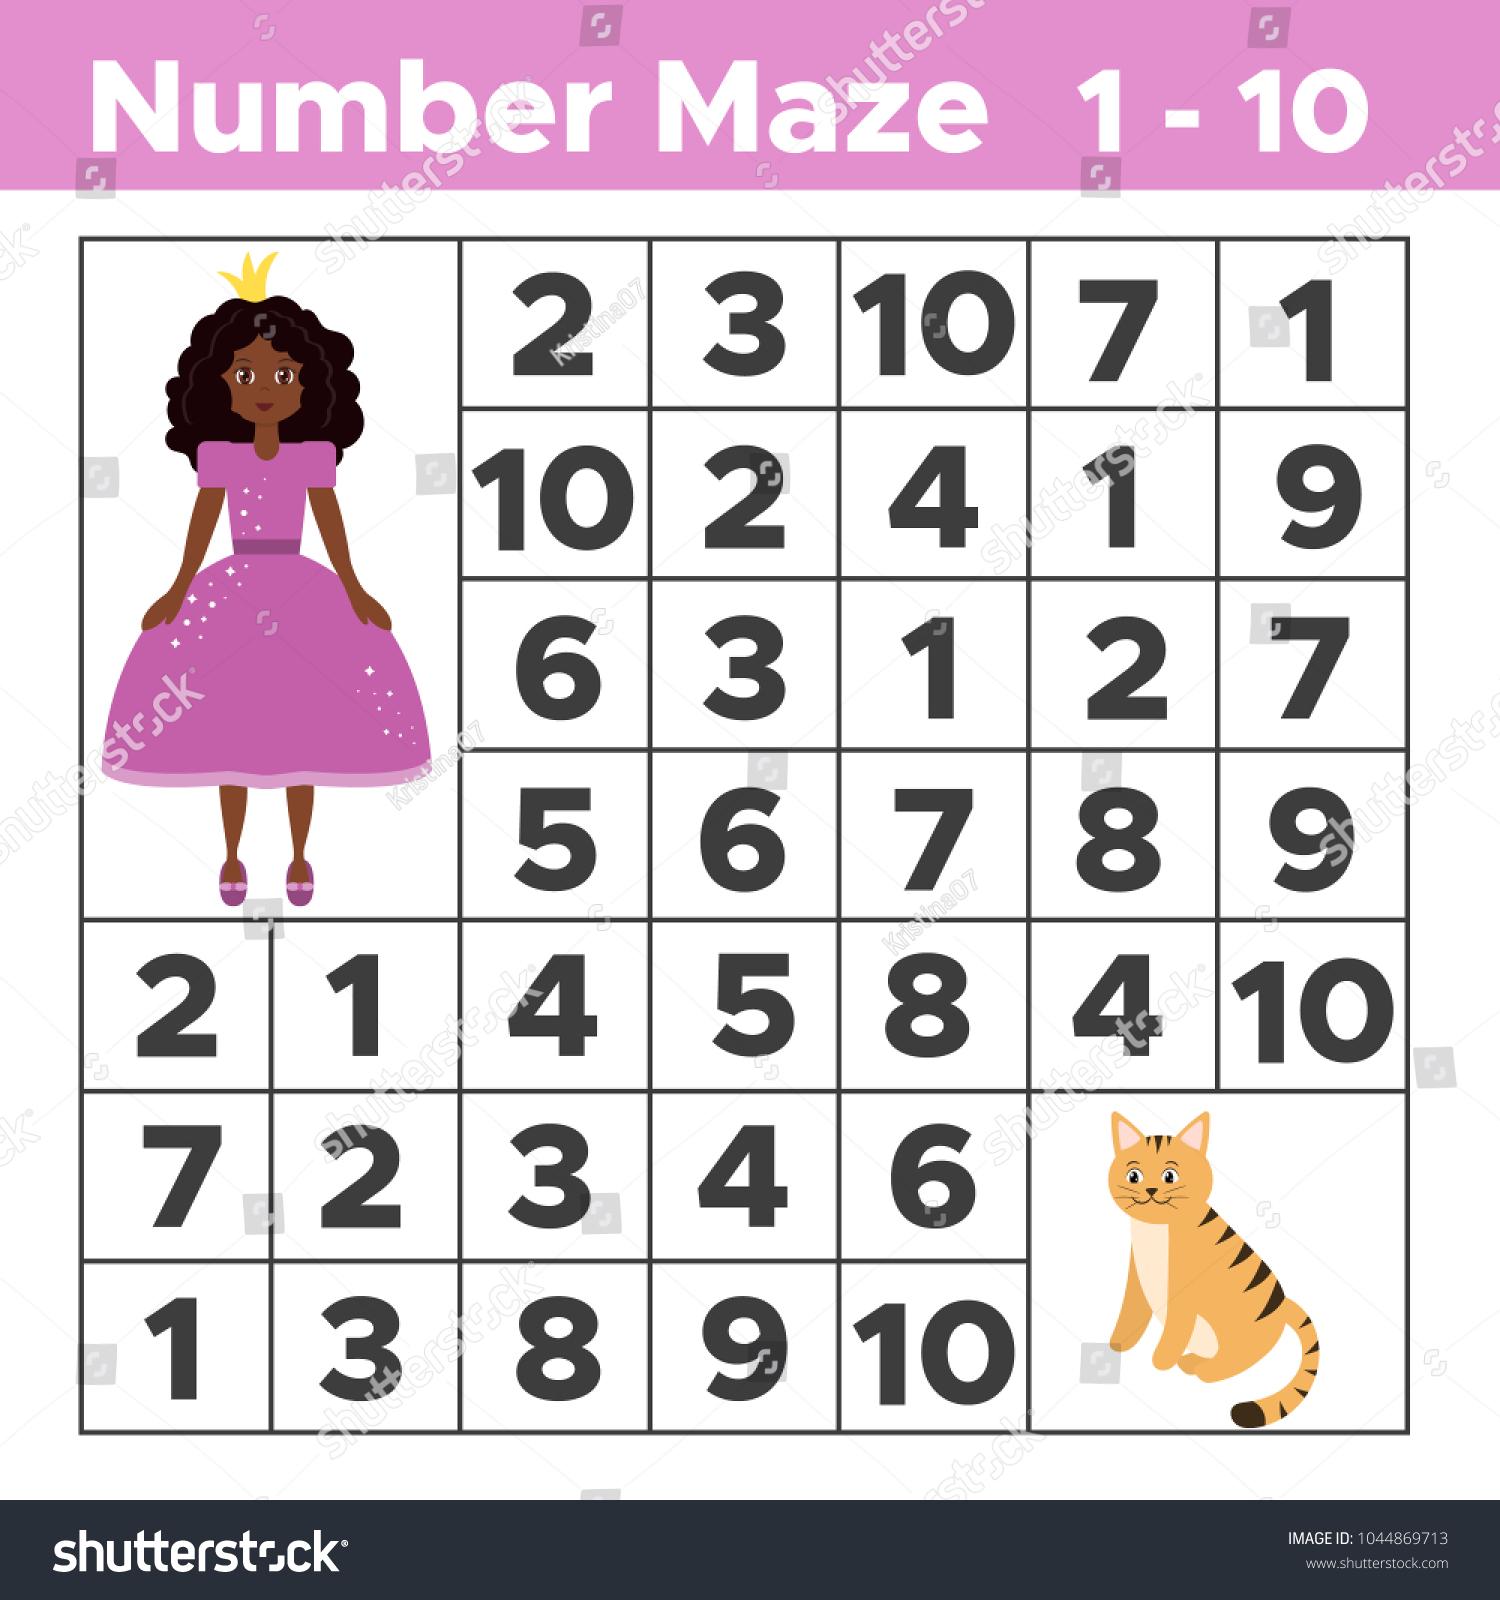 Fine Educational Games For Year 1 Ideas - Math Worksheets - modopol.com